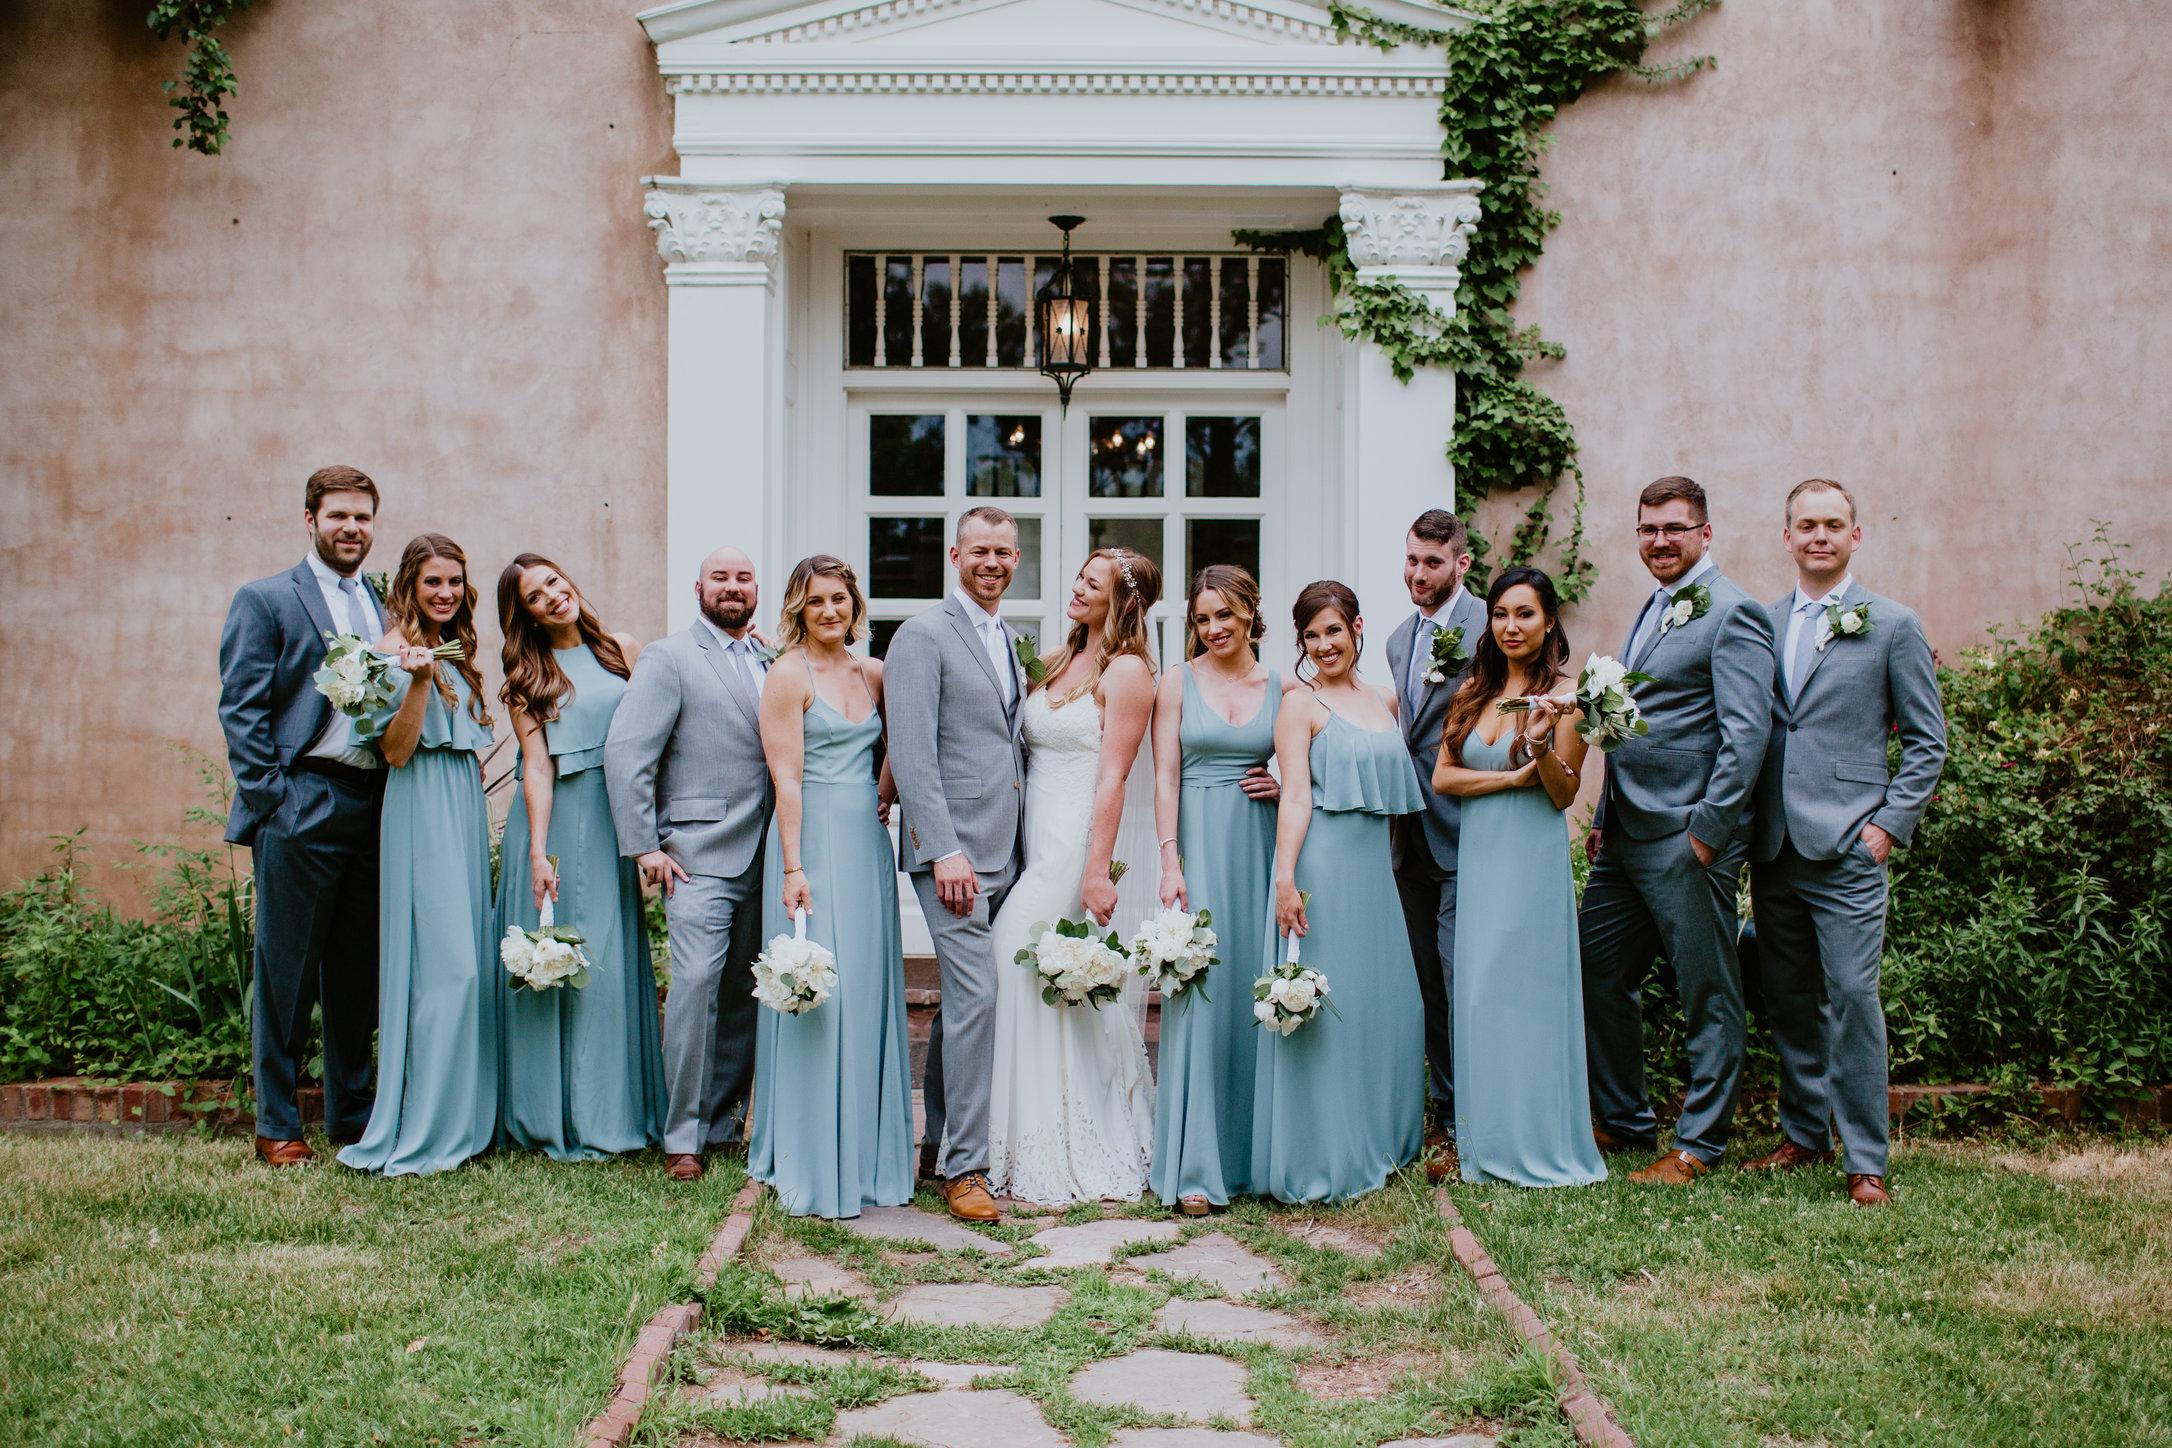 DandA-wedding-420.jpg